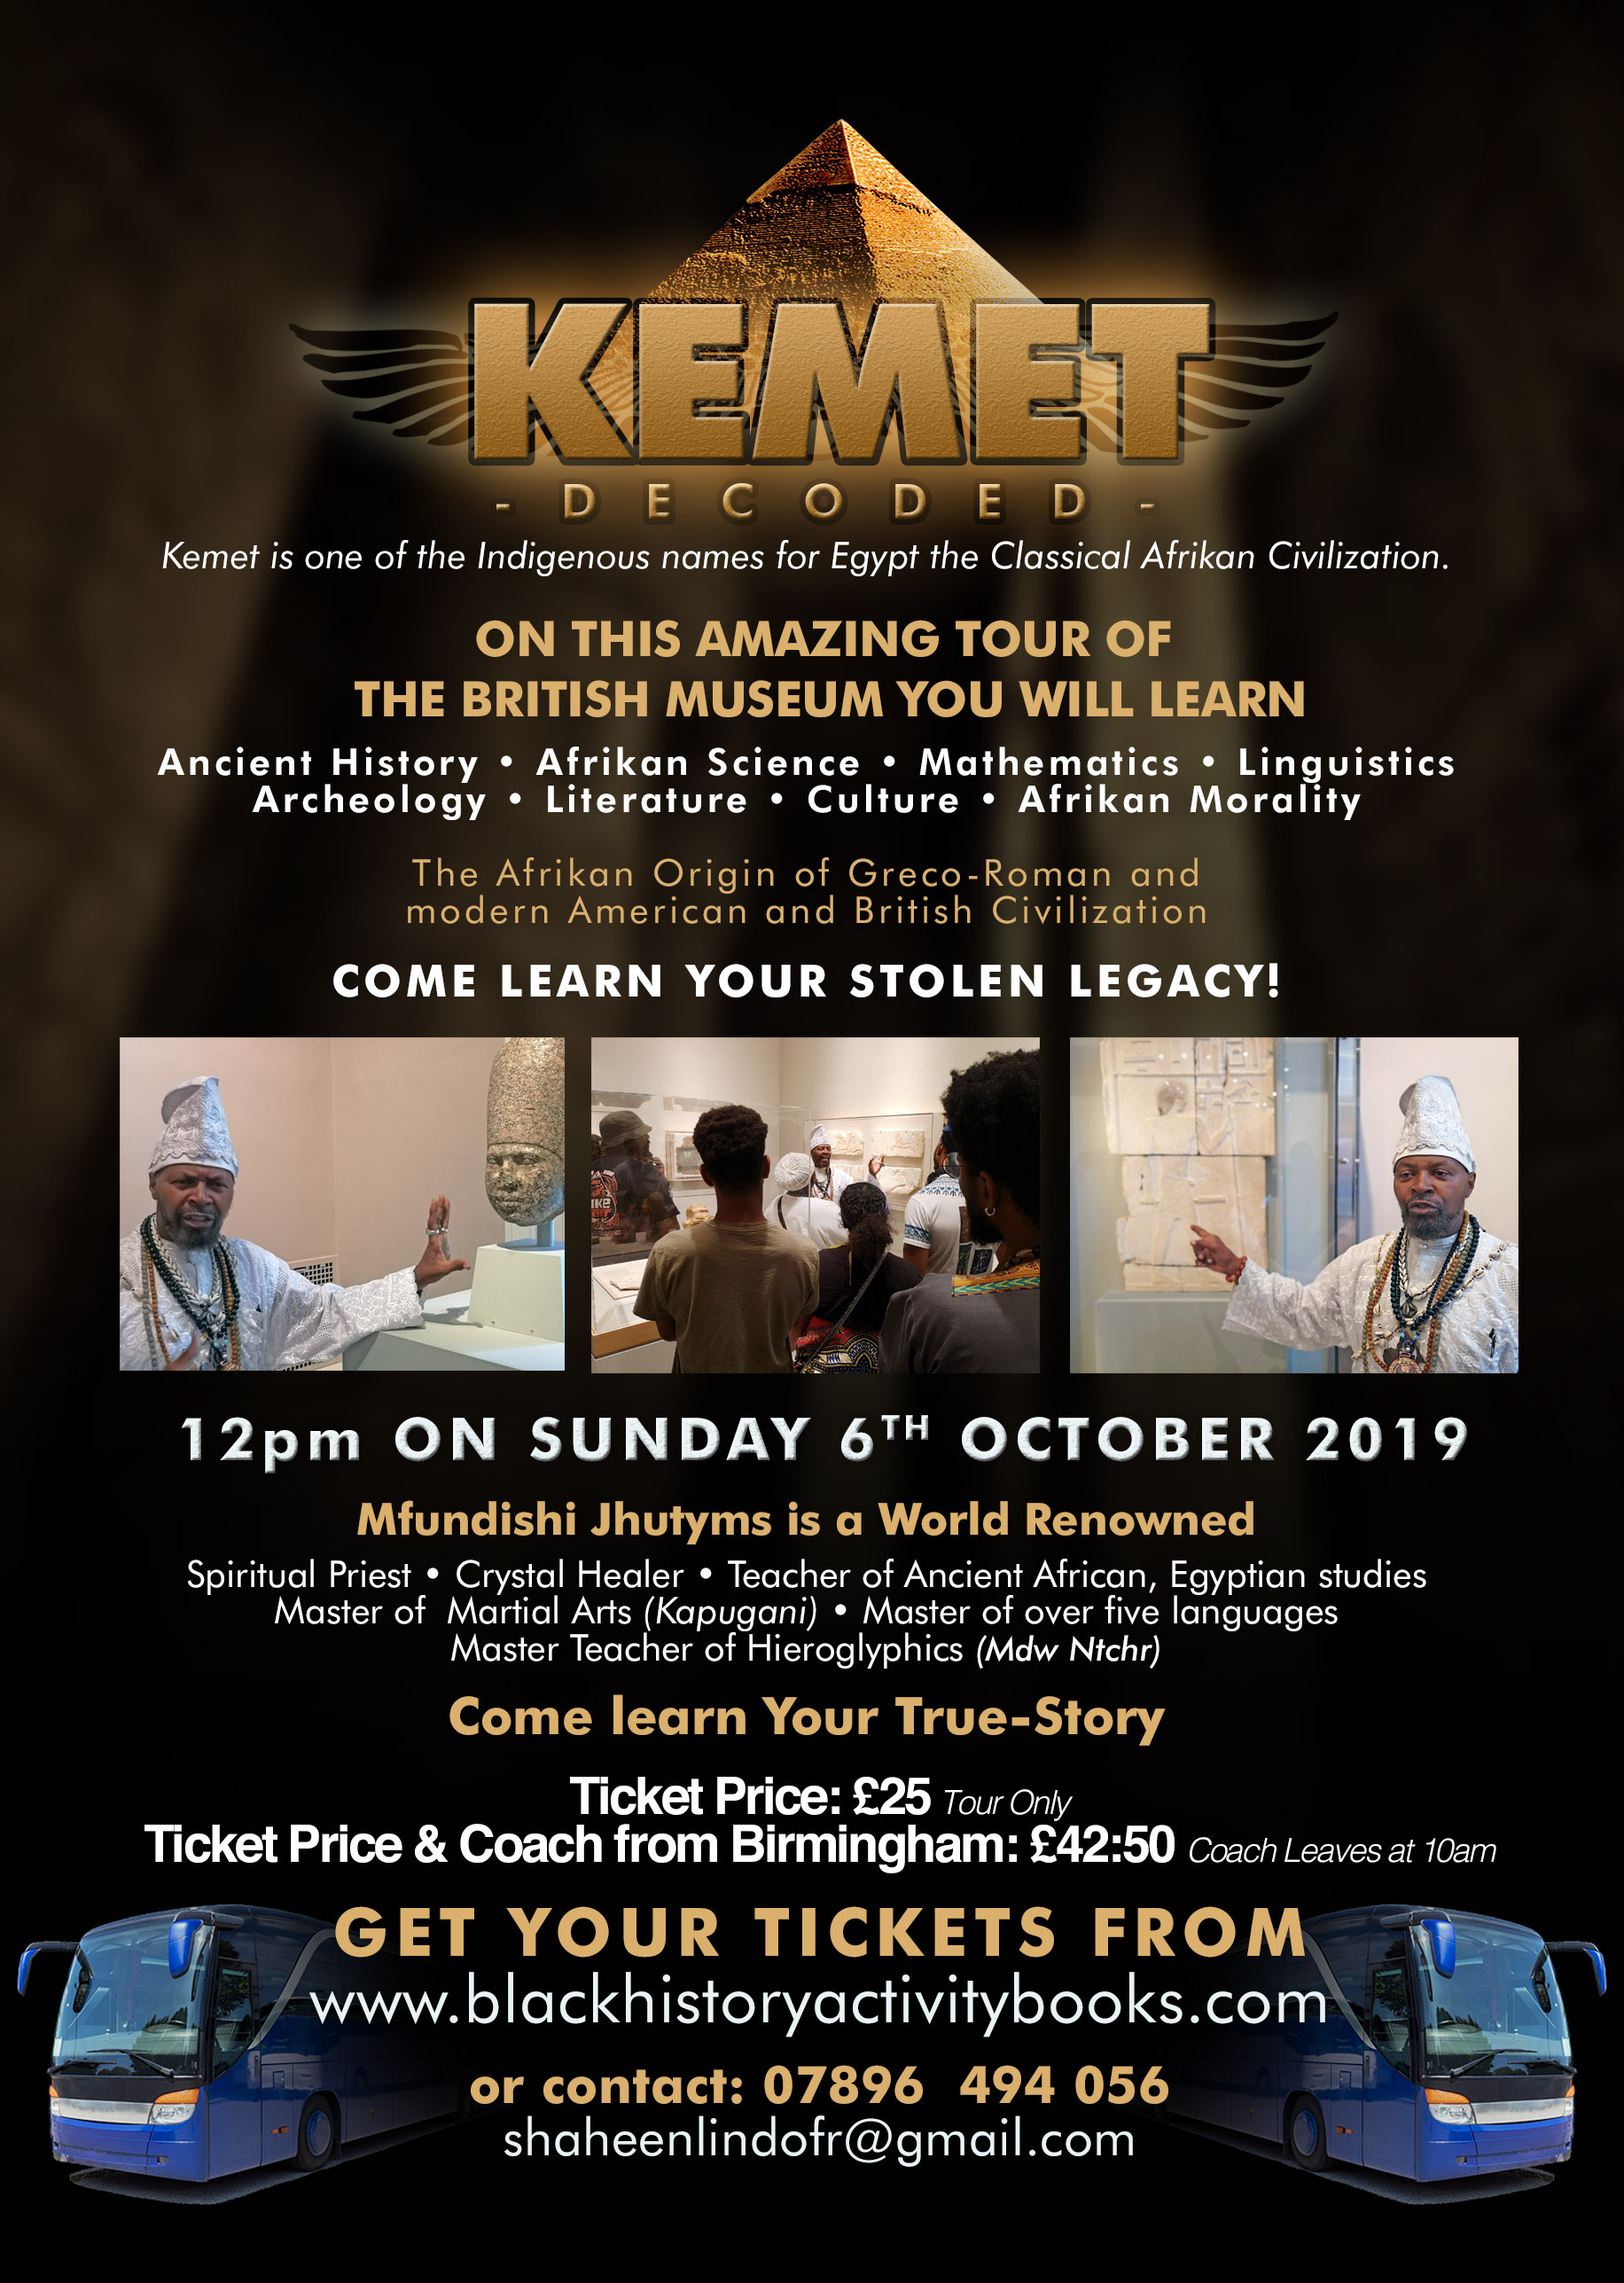 Museum Tour & Coach Ticket from Birmingham